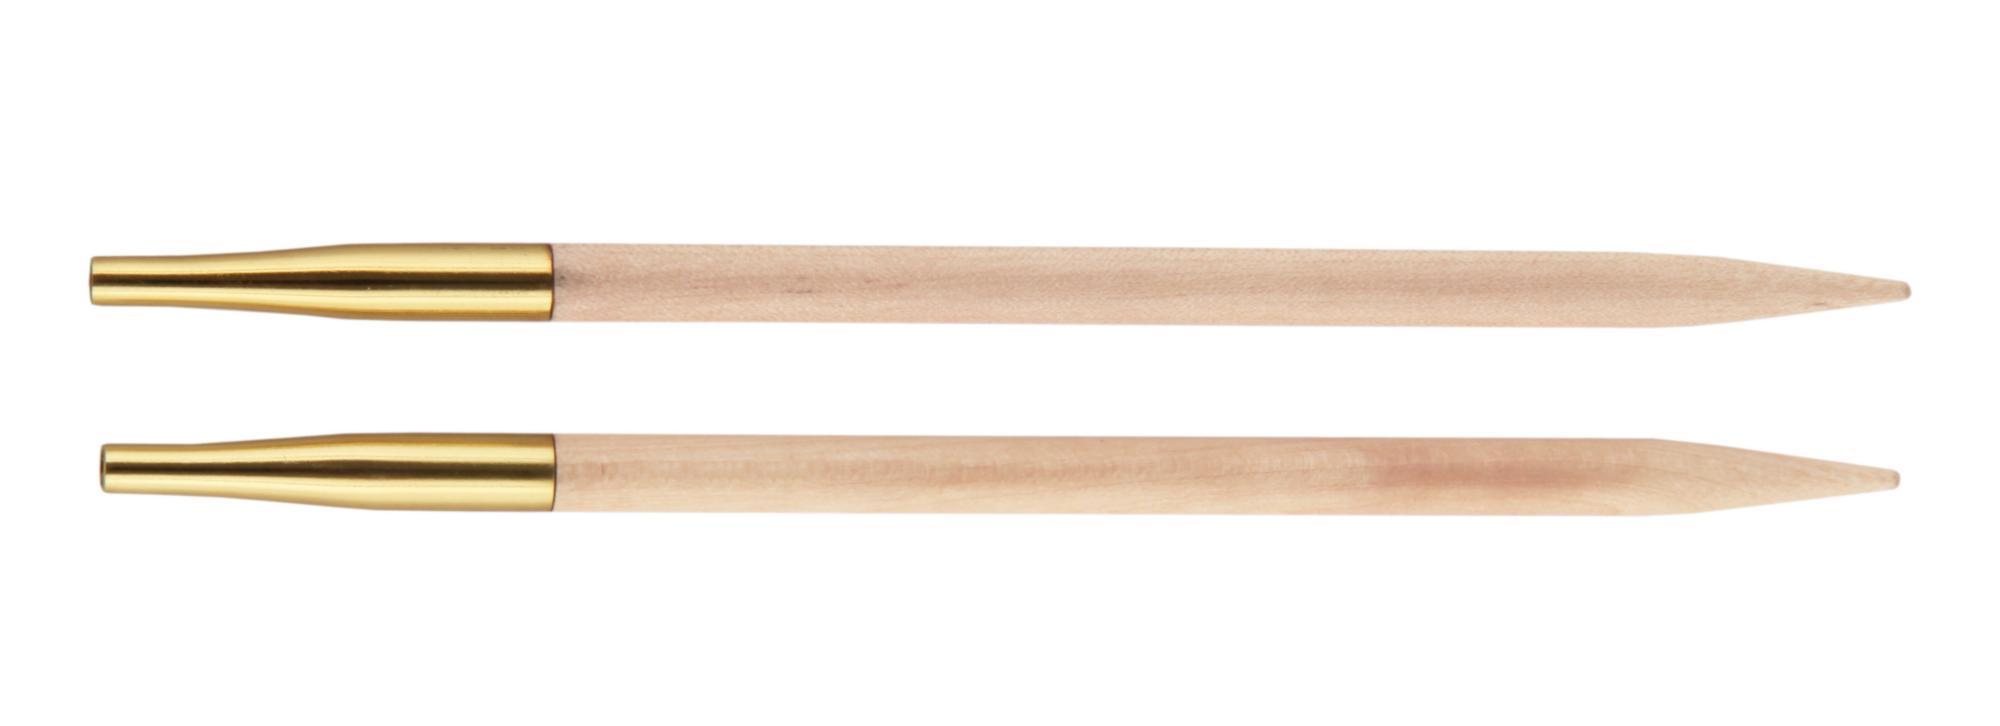 Спицы съемные Basix Birch Wood KnitPro, 35638, 5.50 мм